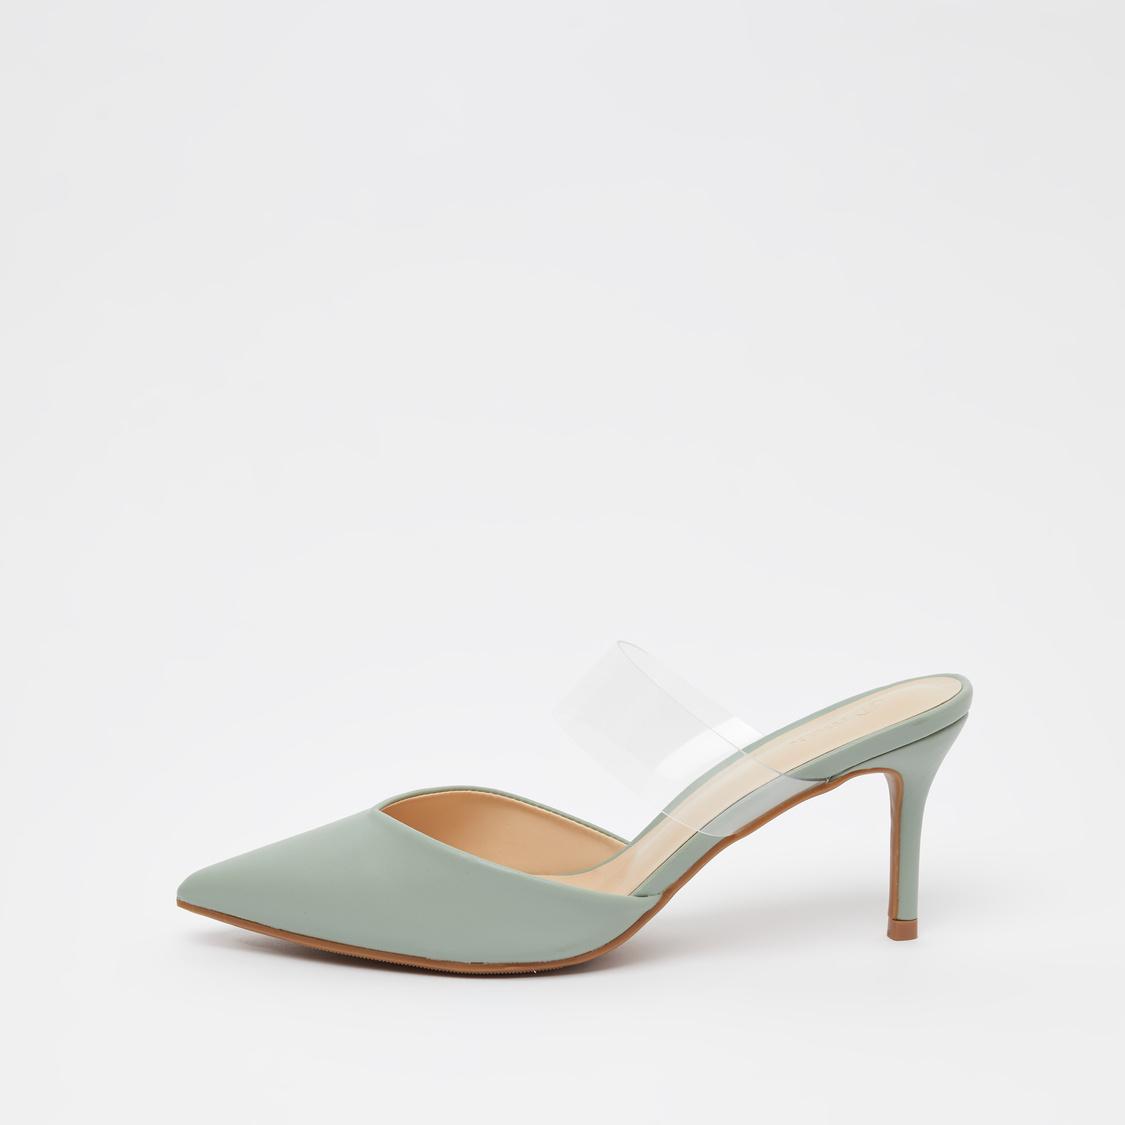 Pointed Toe Slip On Heeled Mules